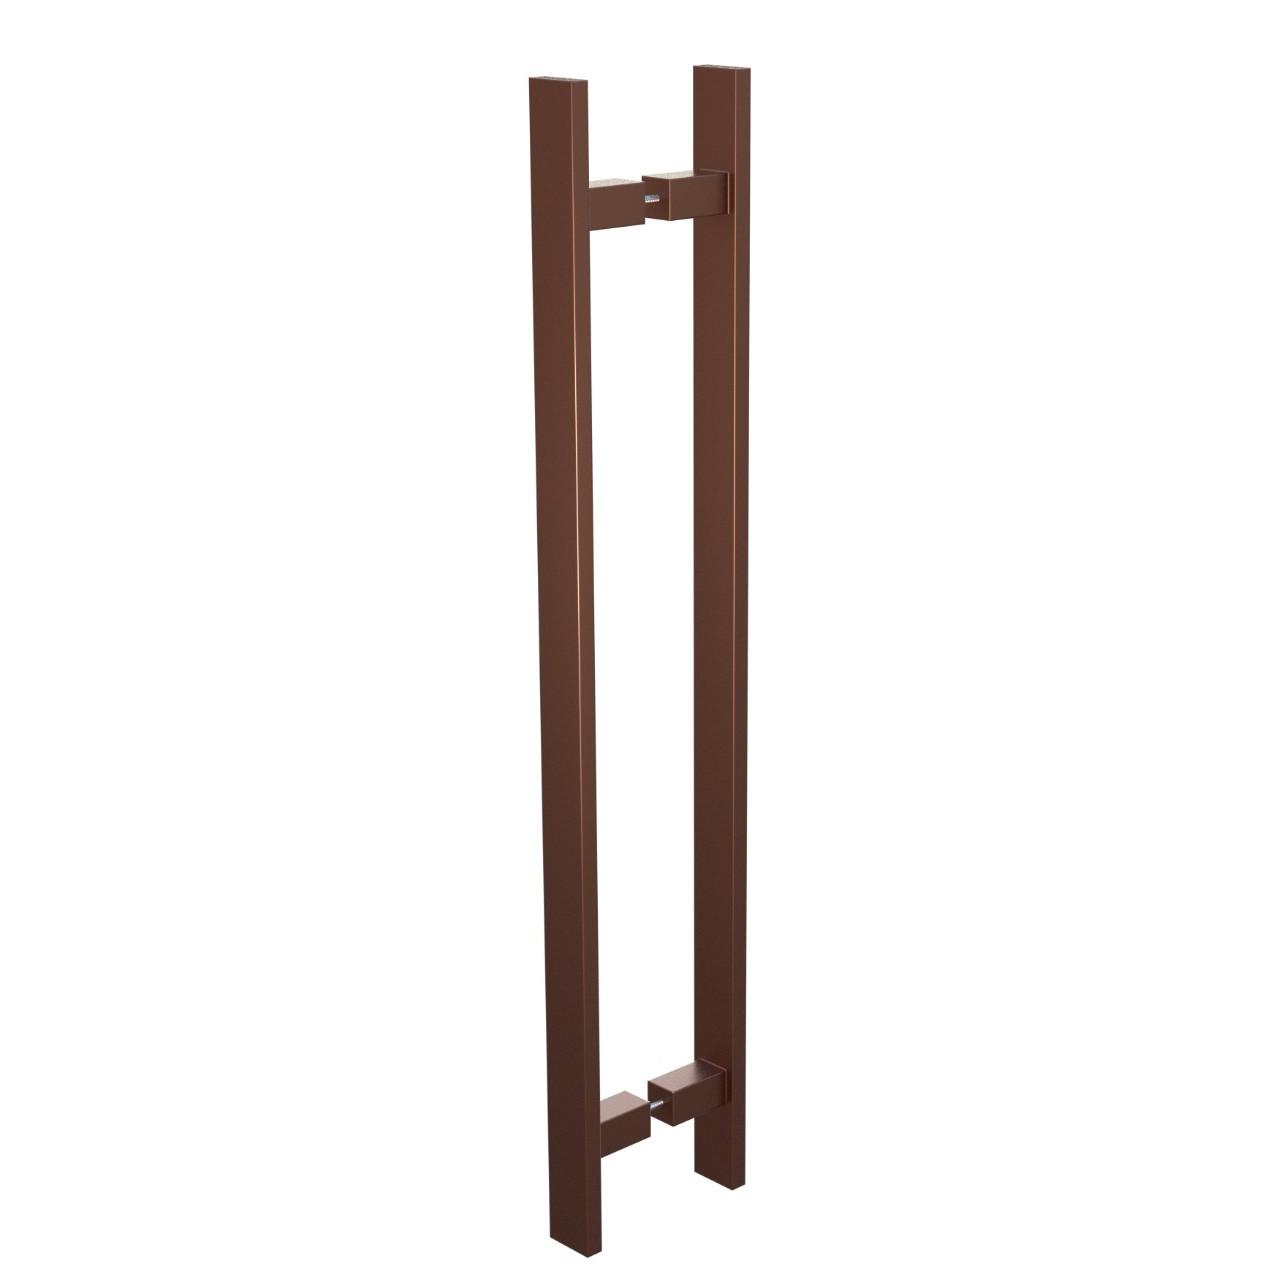 Puxador de Portas Sobrepor Aco Inox 30 cm 1 par Trio Bronze - Acobrasil